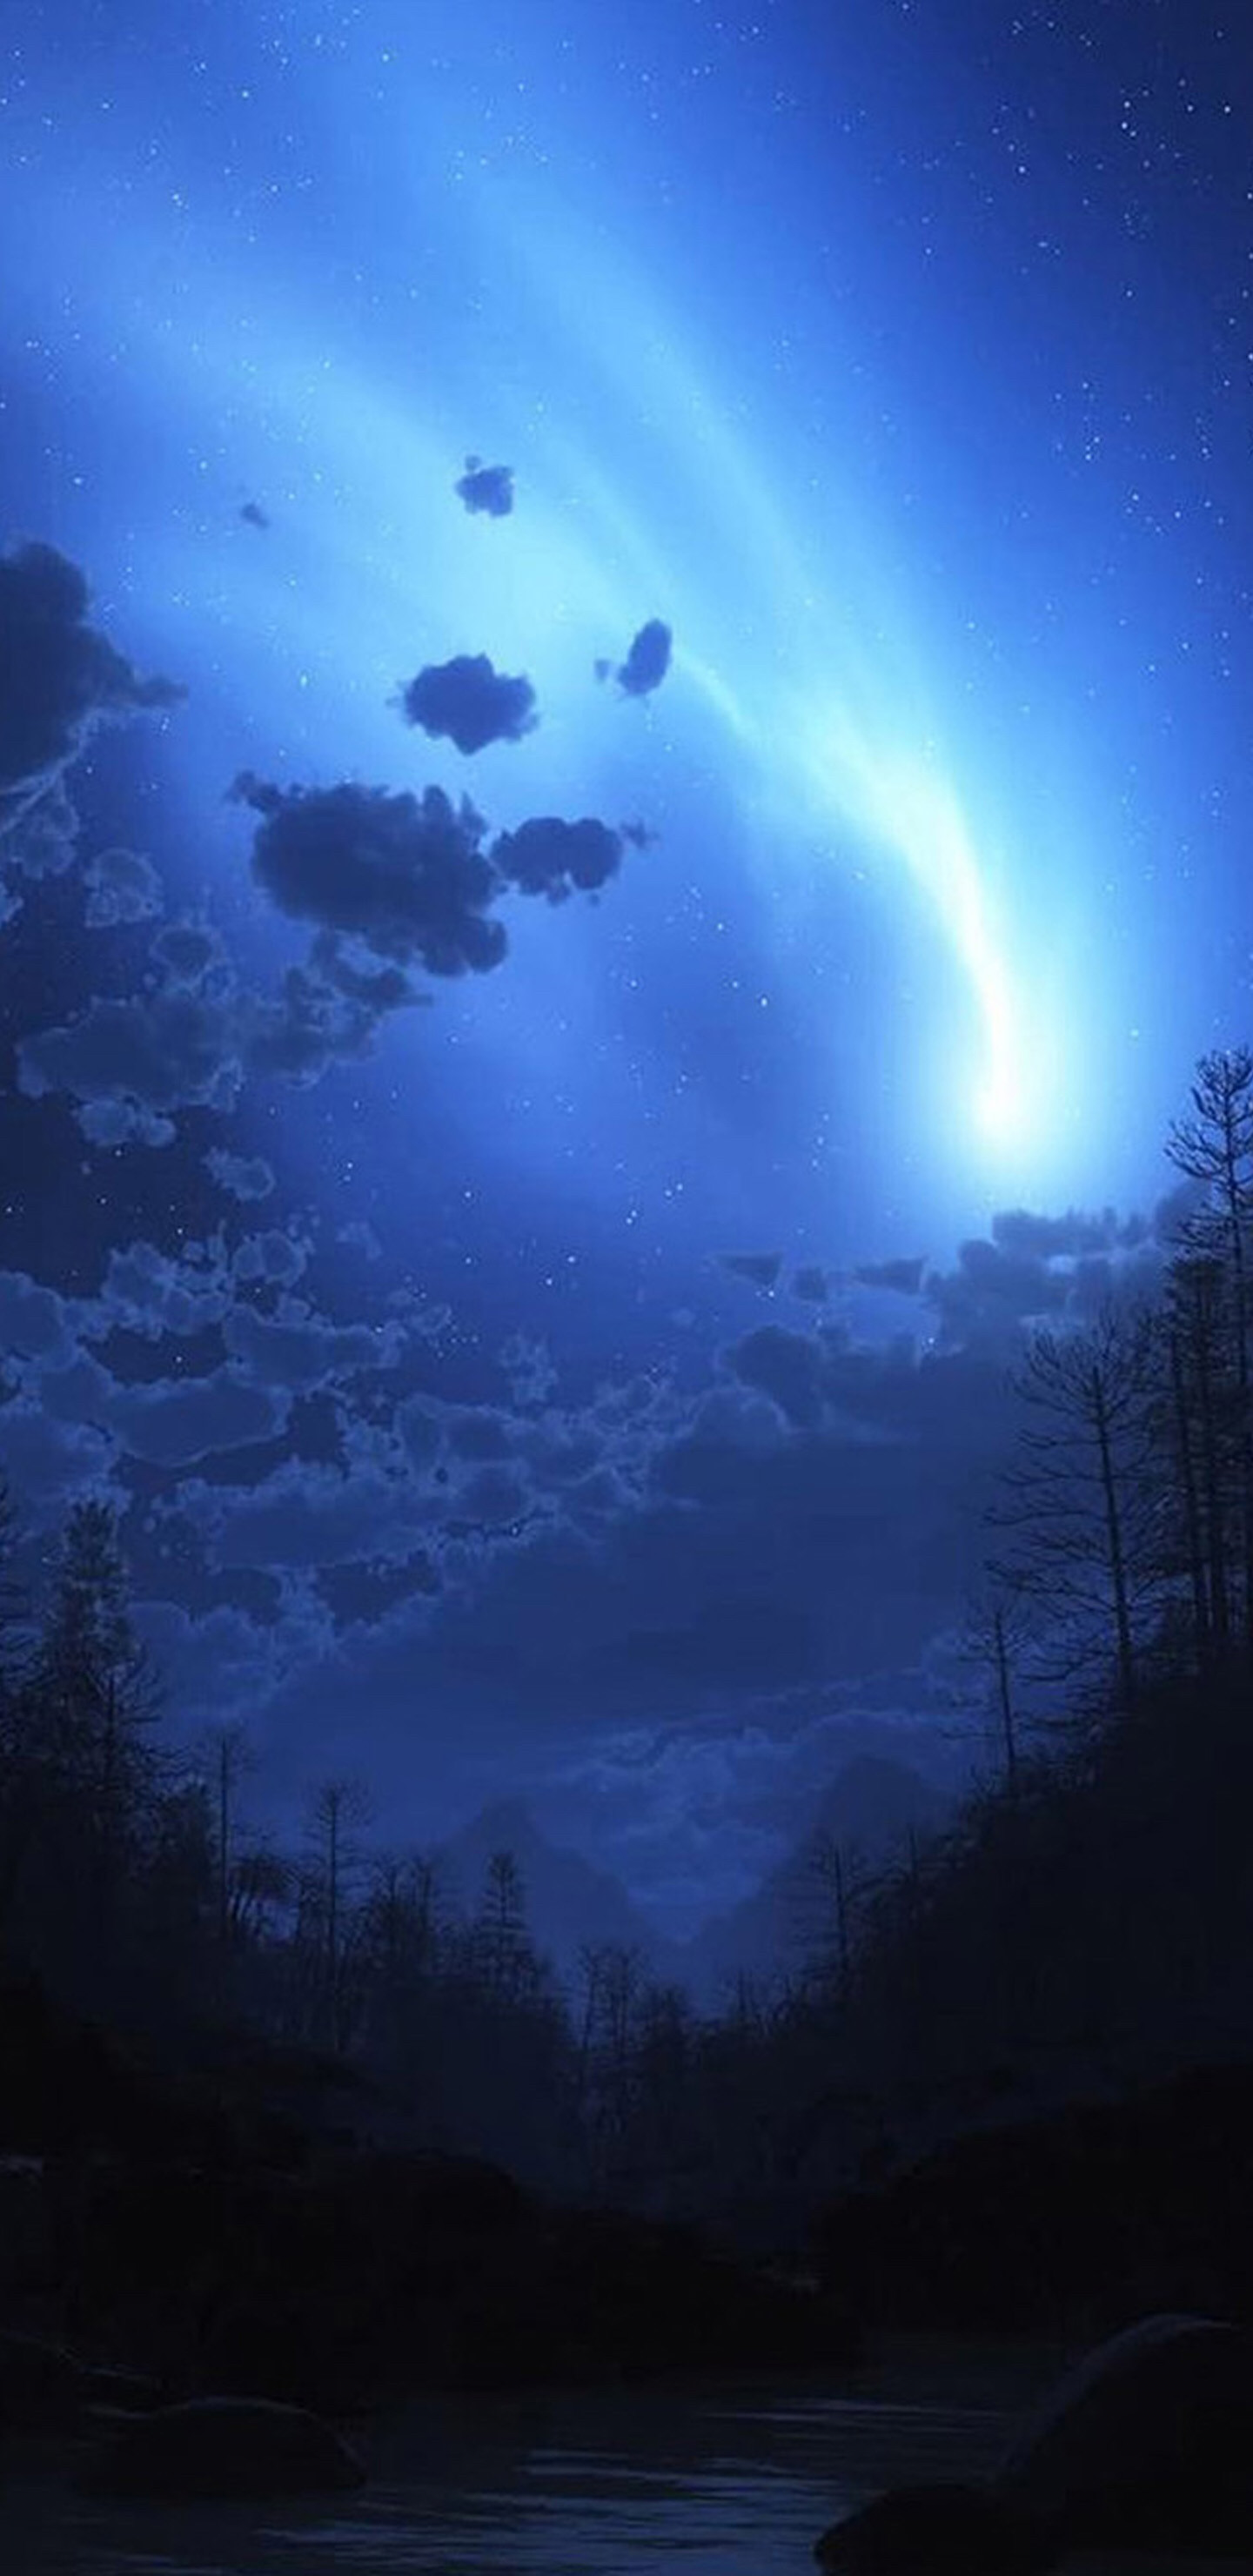 Blue, night, sky, storm, minimal, abstract, wallpaper, galaxy,